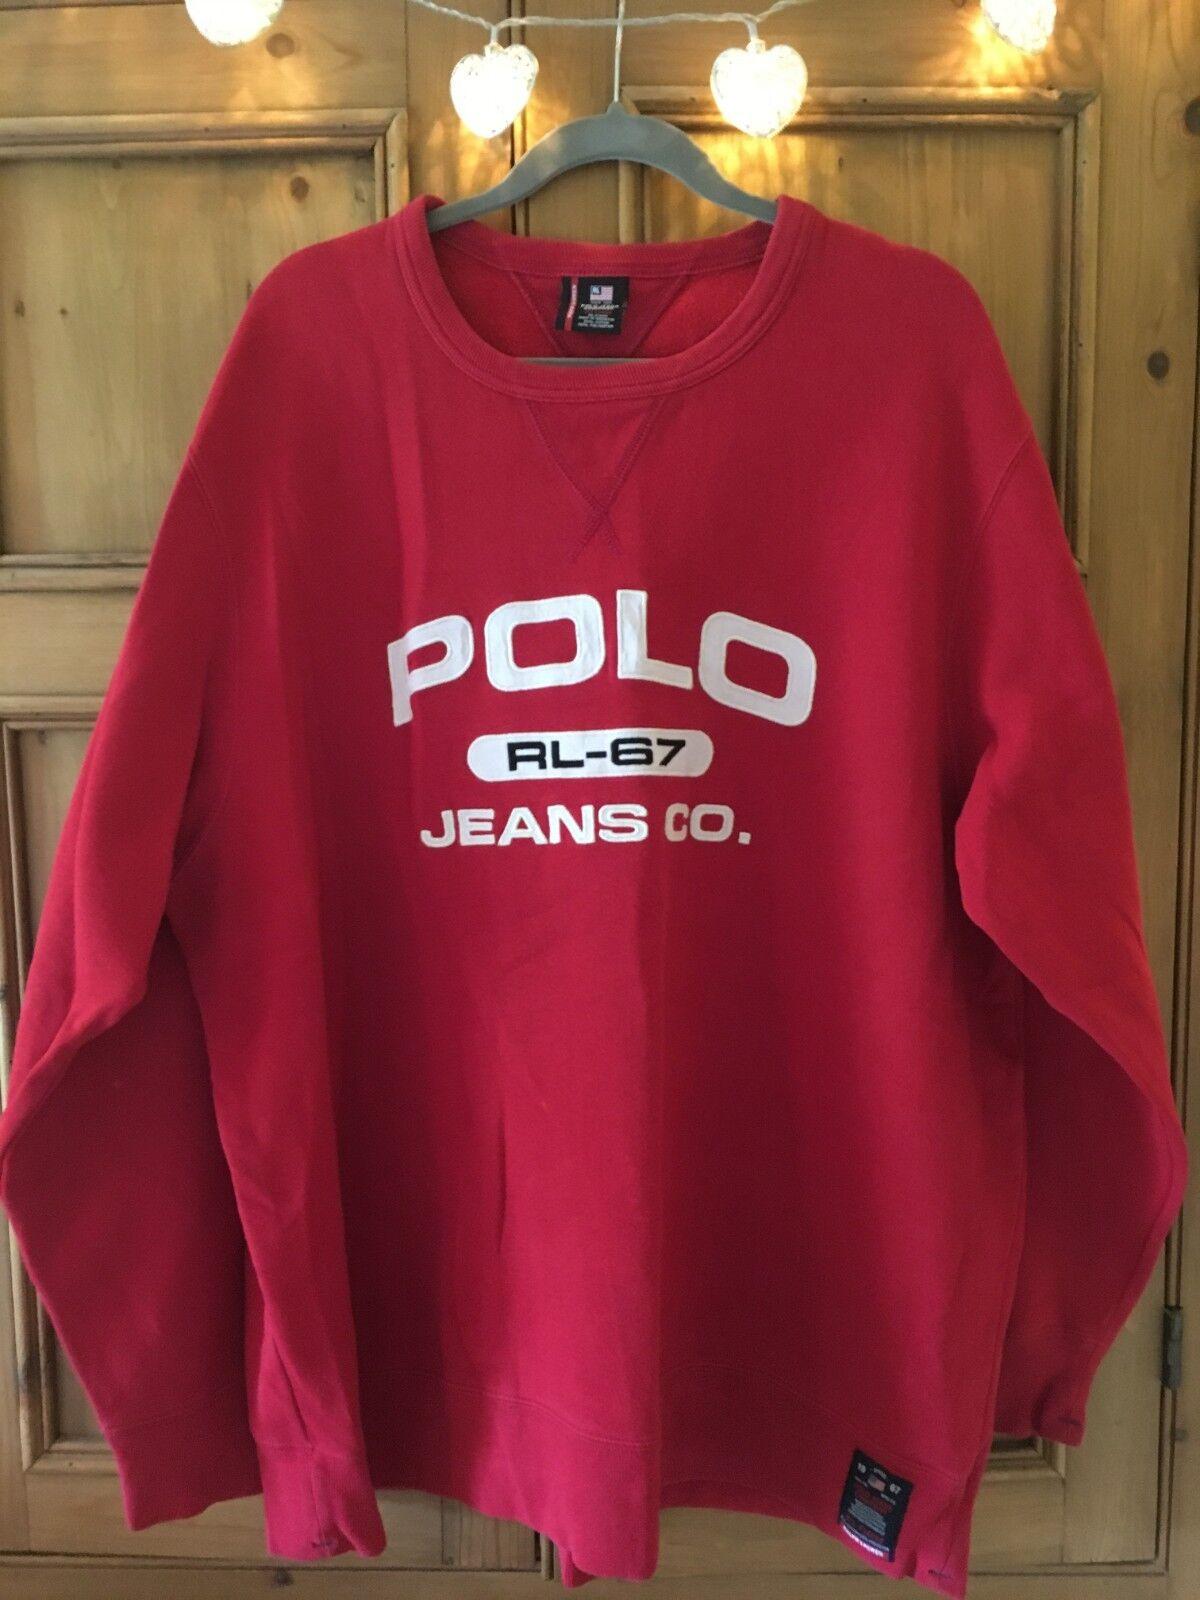 Vintage Ralph Lauren POLO Jeans Oversized Sweatshirt XXL